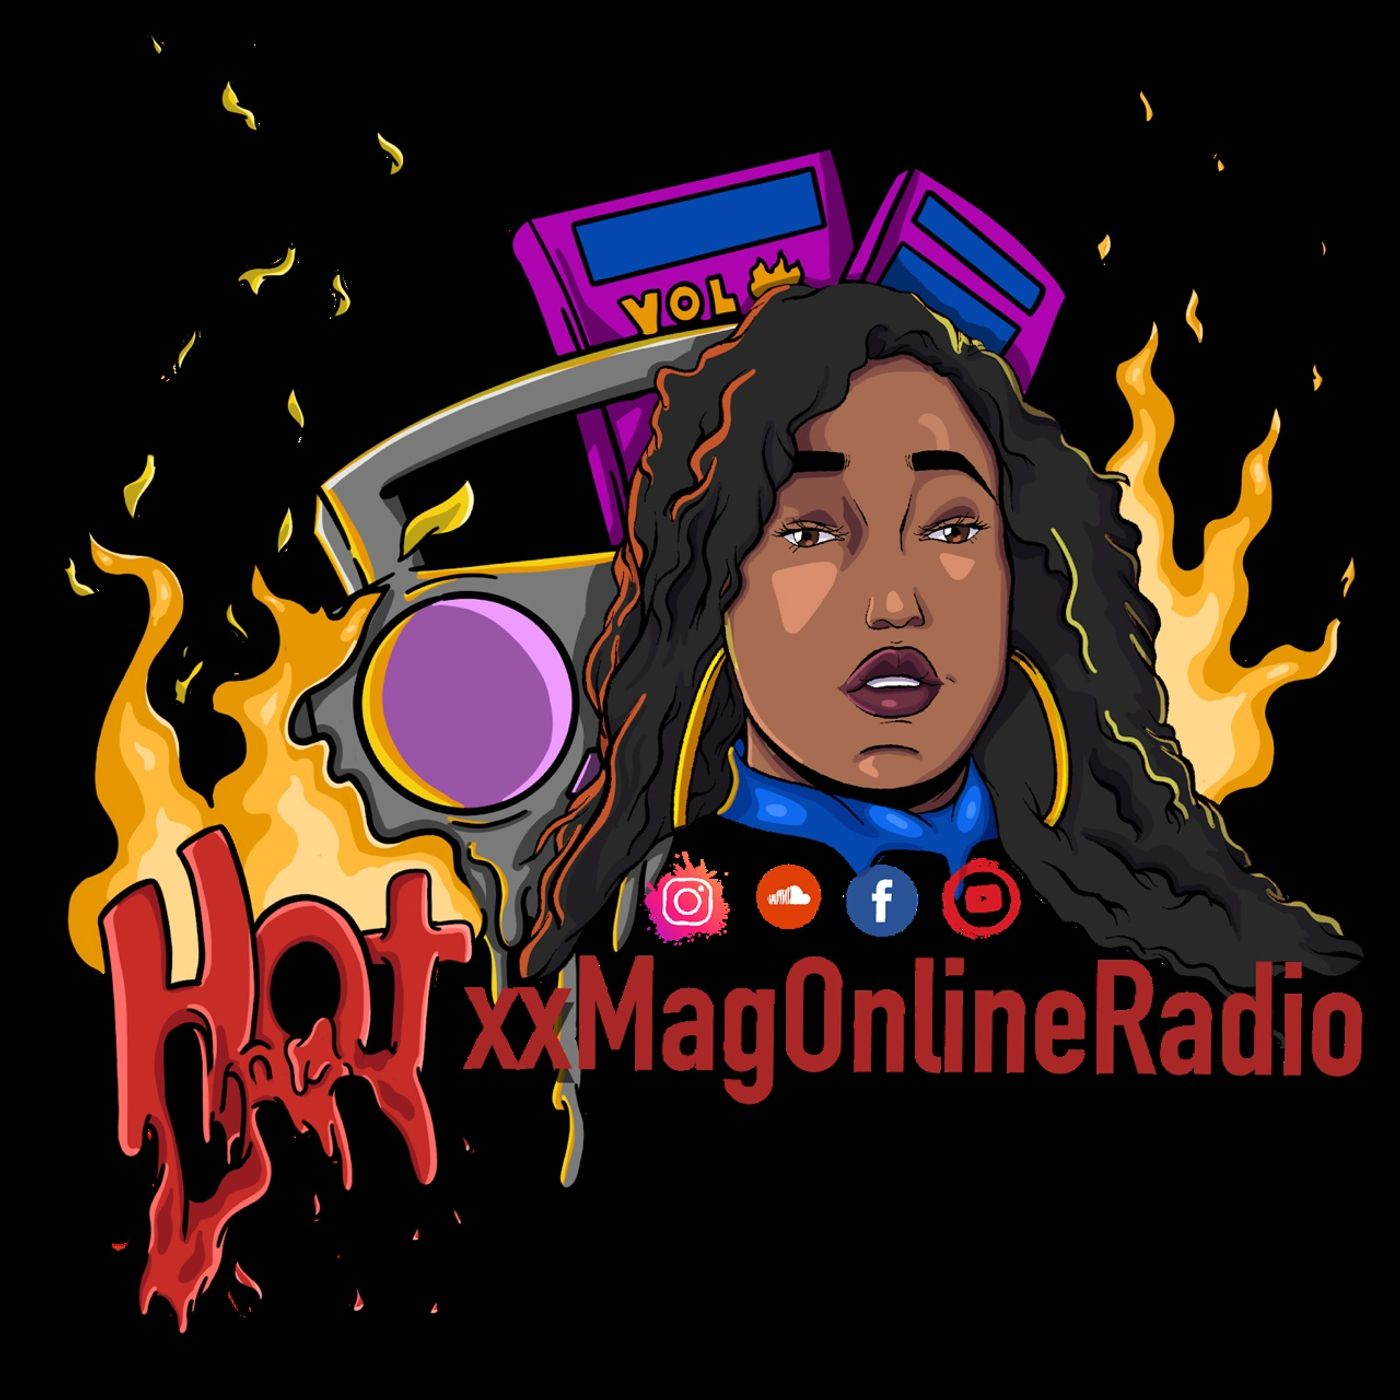 HotxxMagOnlineRadio LIVE #UndergroundMusicHour